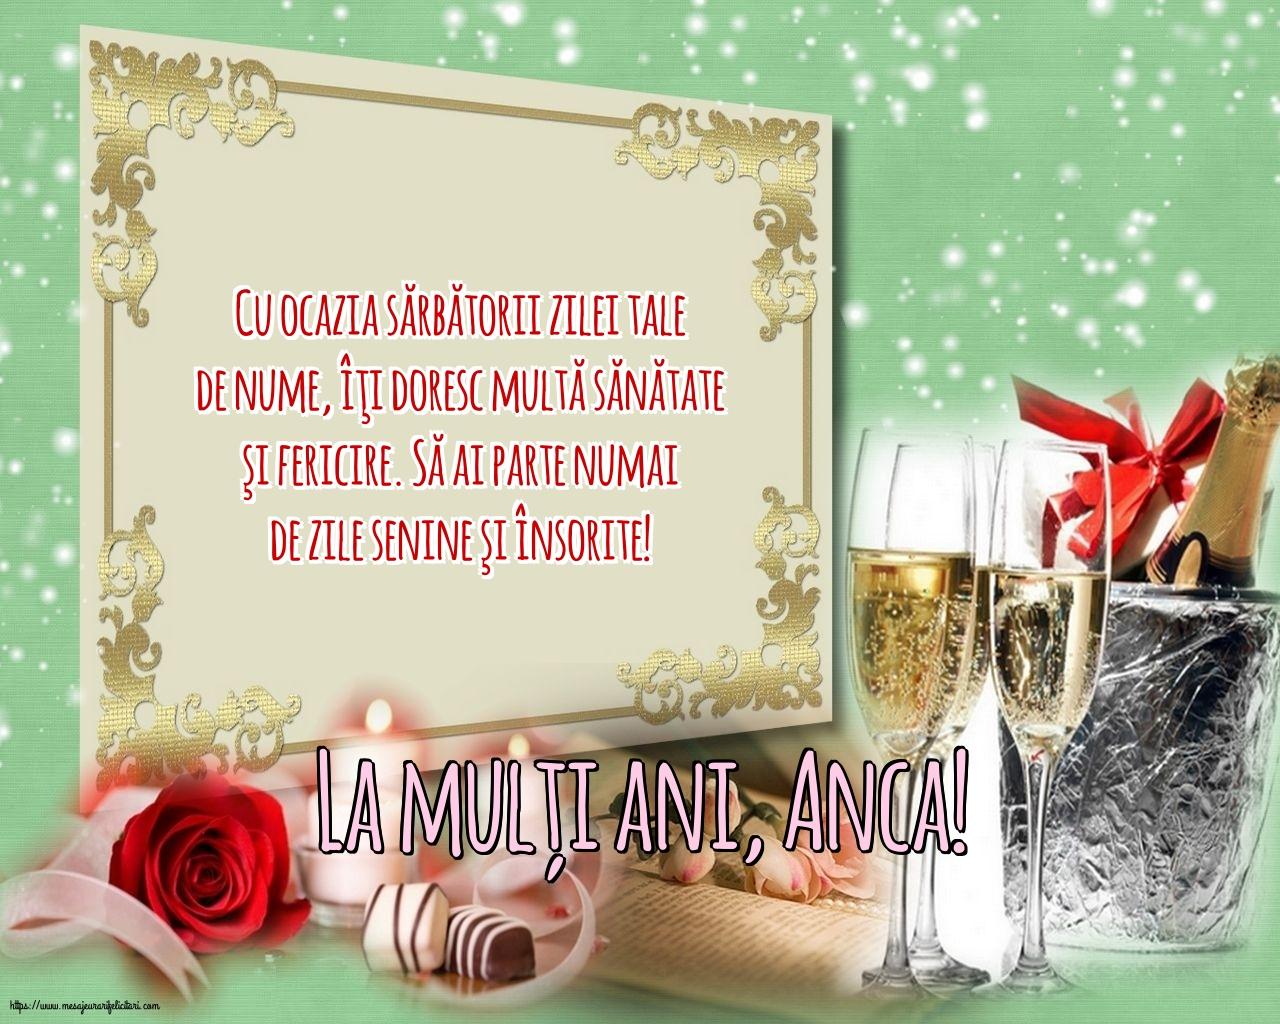 Felicitari de Sfanta Ana - La mulți ani, Anca! - mesajeurarifelicitari.com